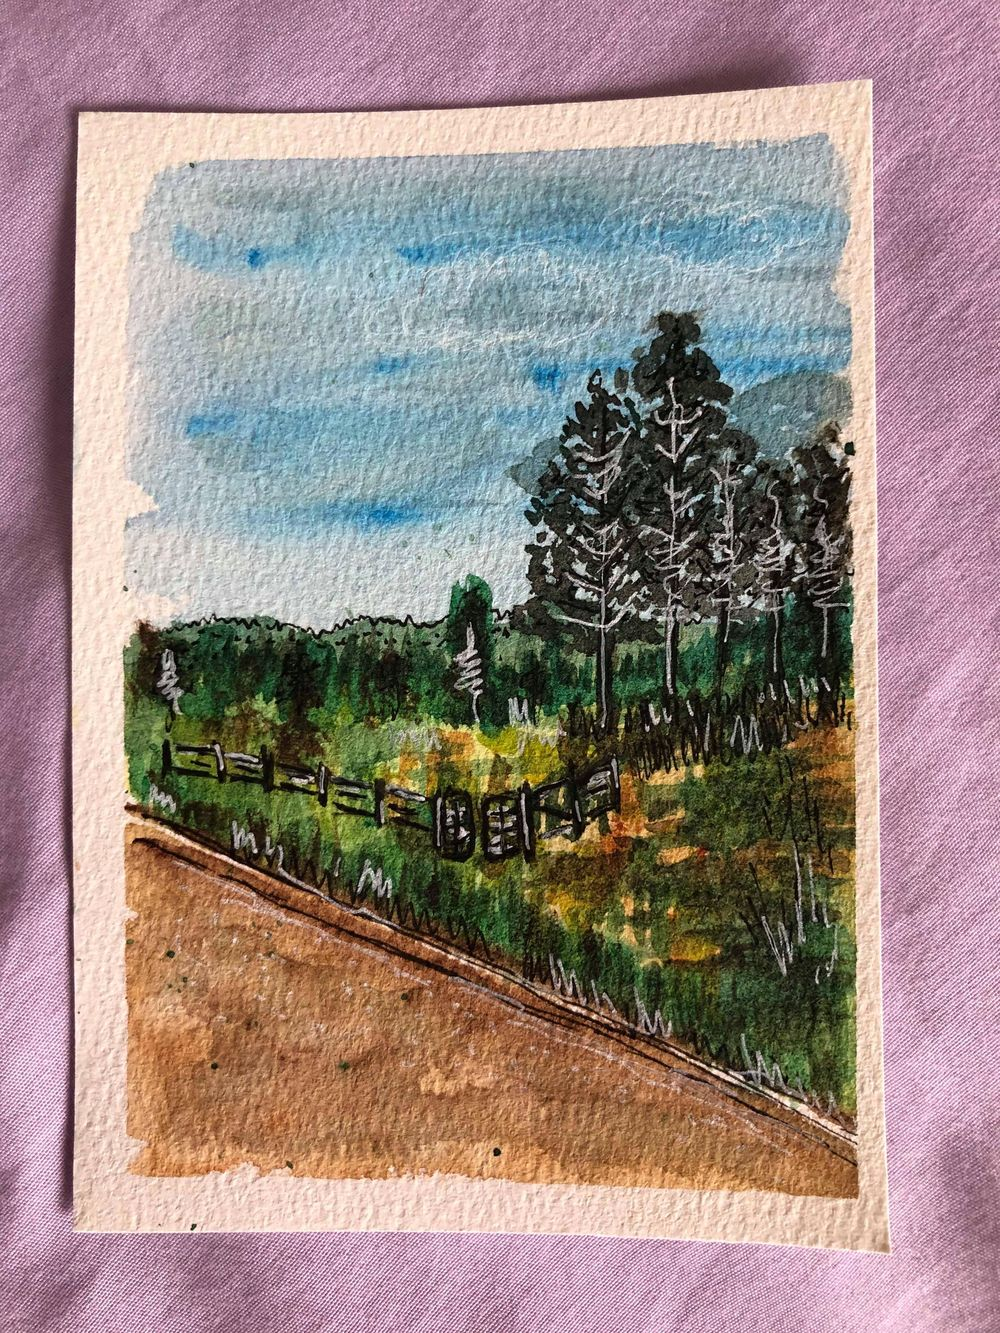 Landscapes - image 3 - student project